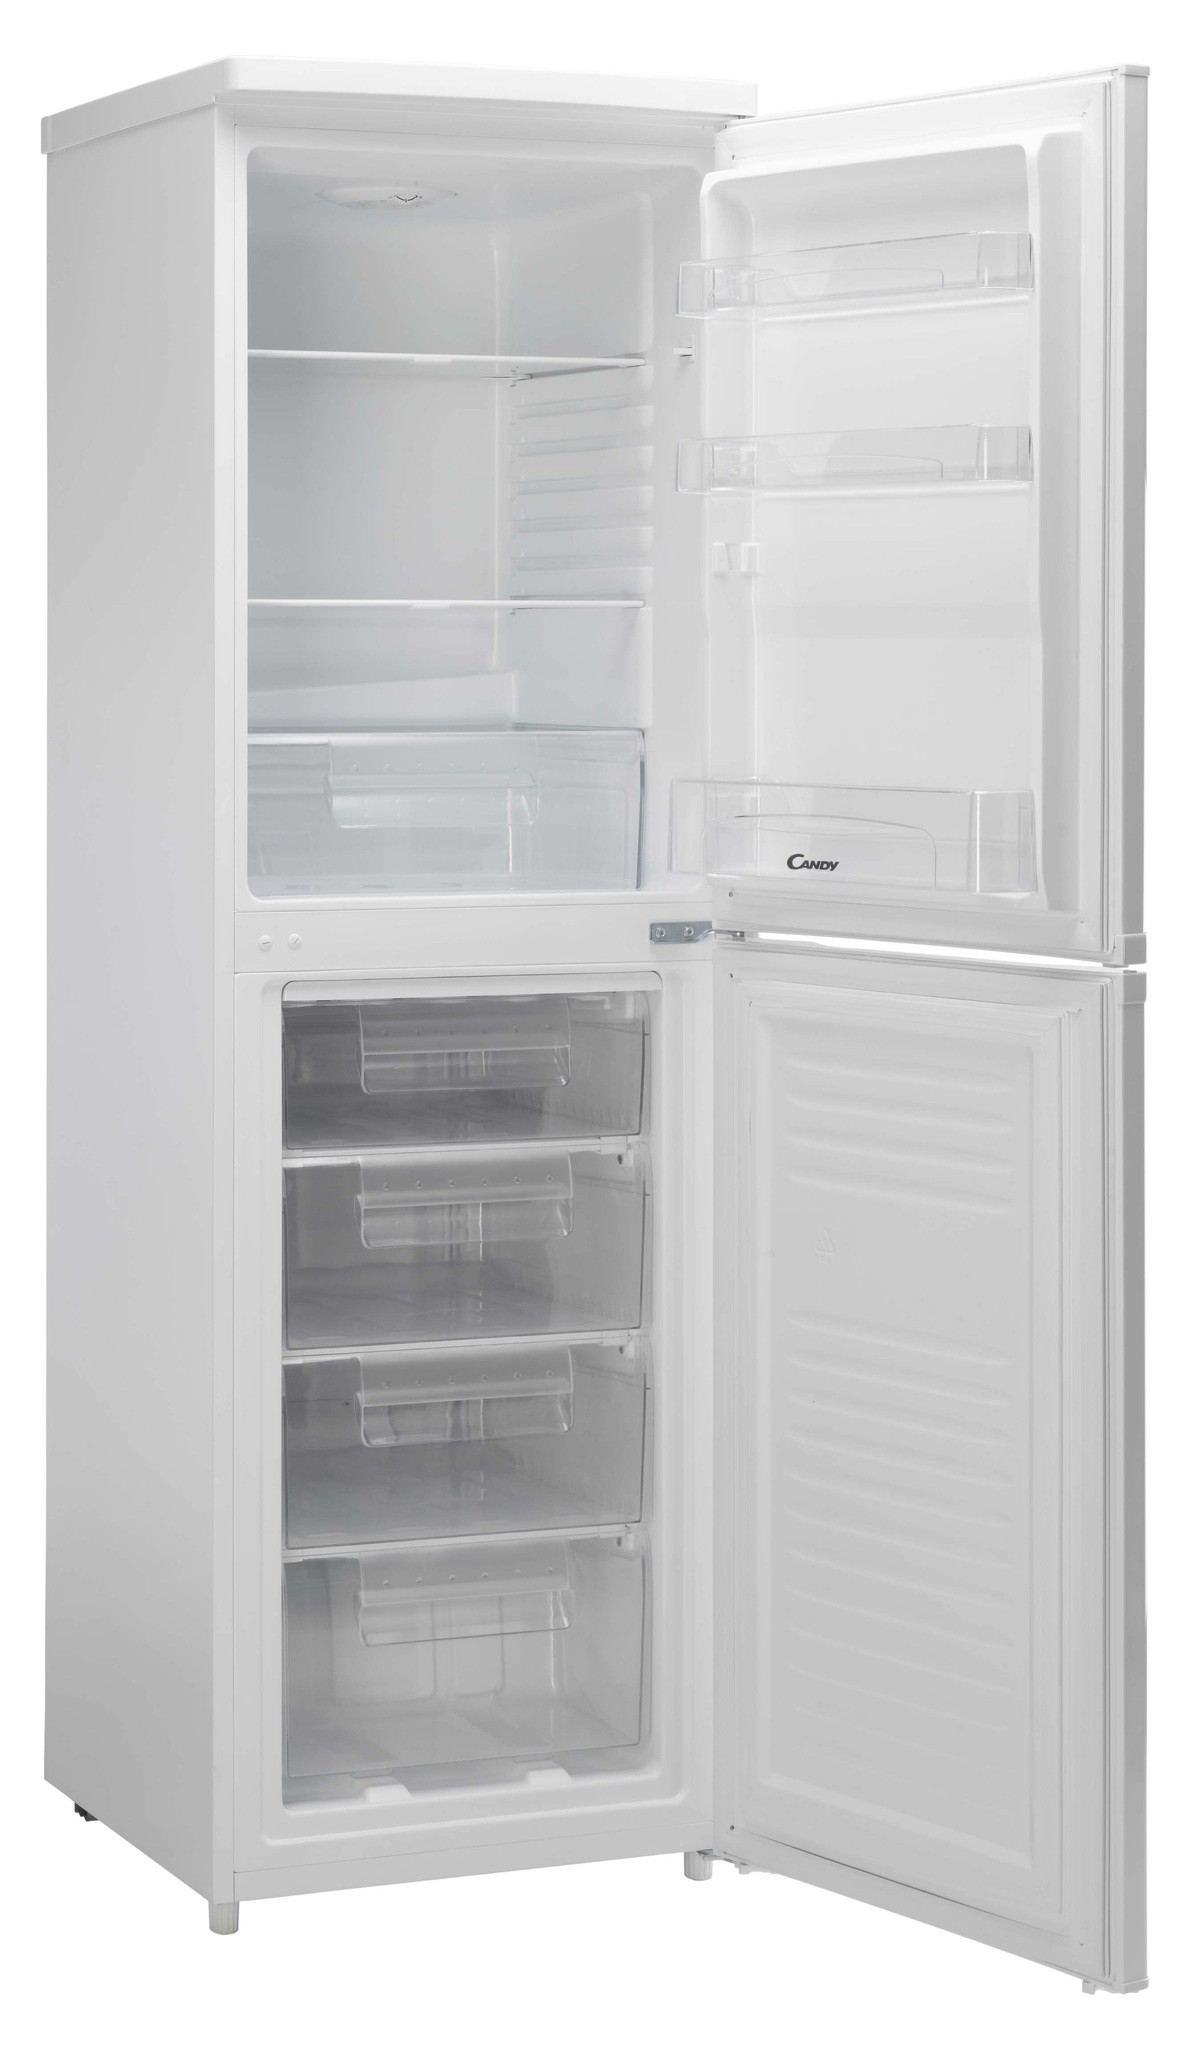 Candy CCBF5172WHK Fridge Freezer